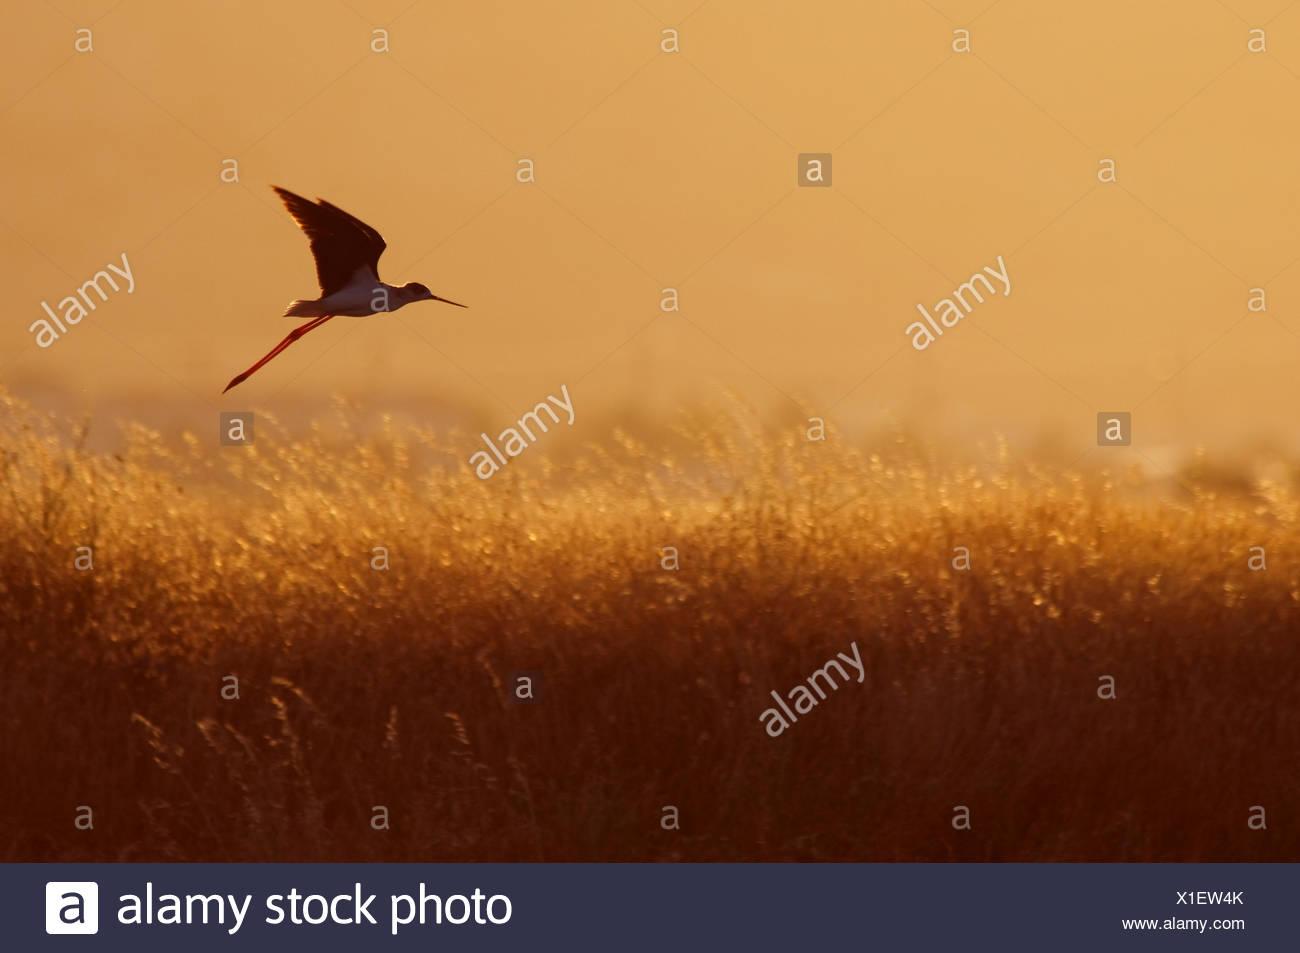 Stelzenläufer (Himantopus Himantopus) im Flug über lange Gräser in der Abenddämmerung, Lesbos, Griechenland Stockbild